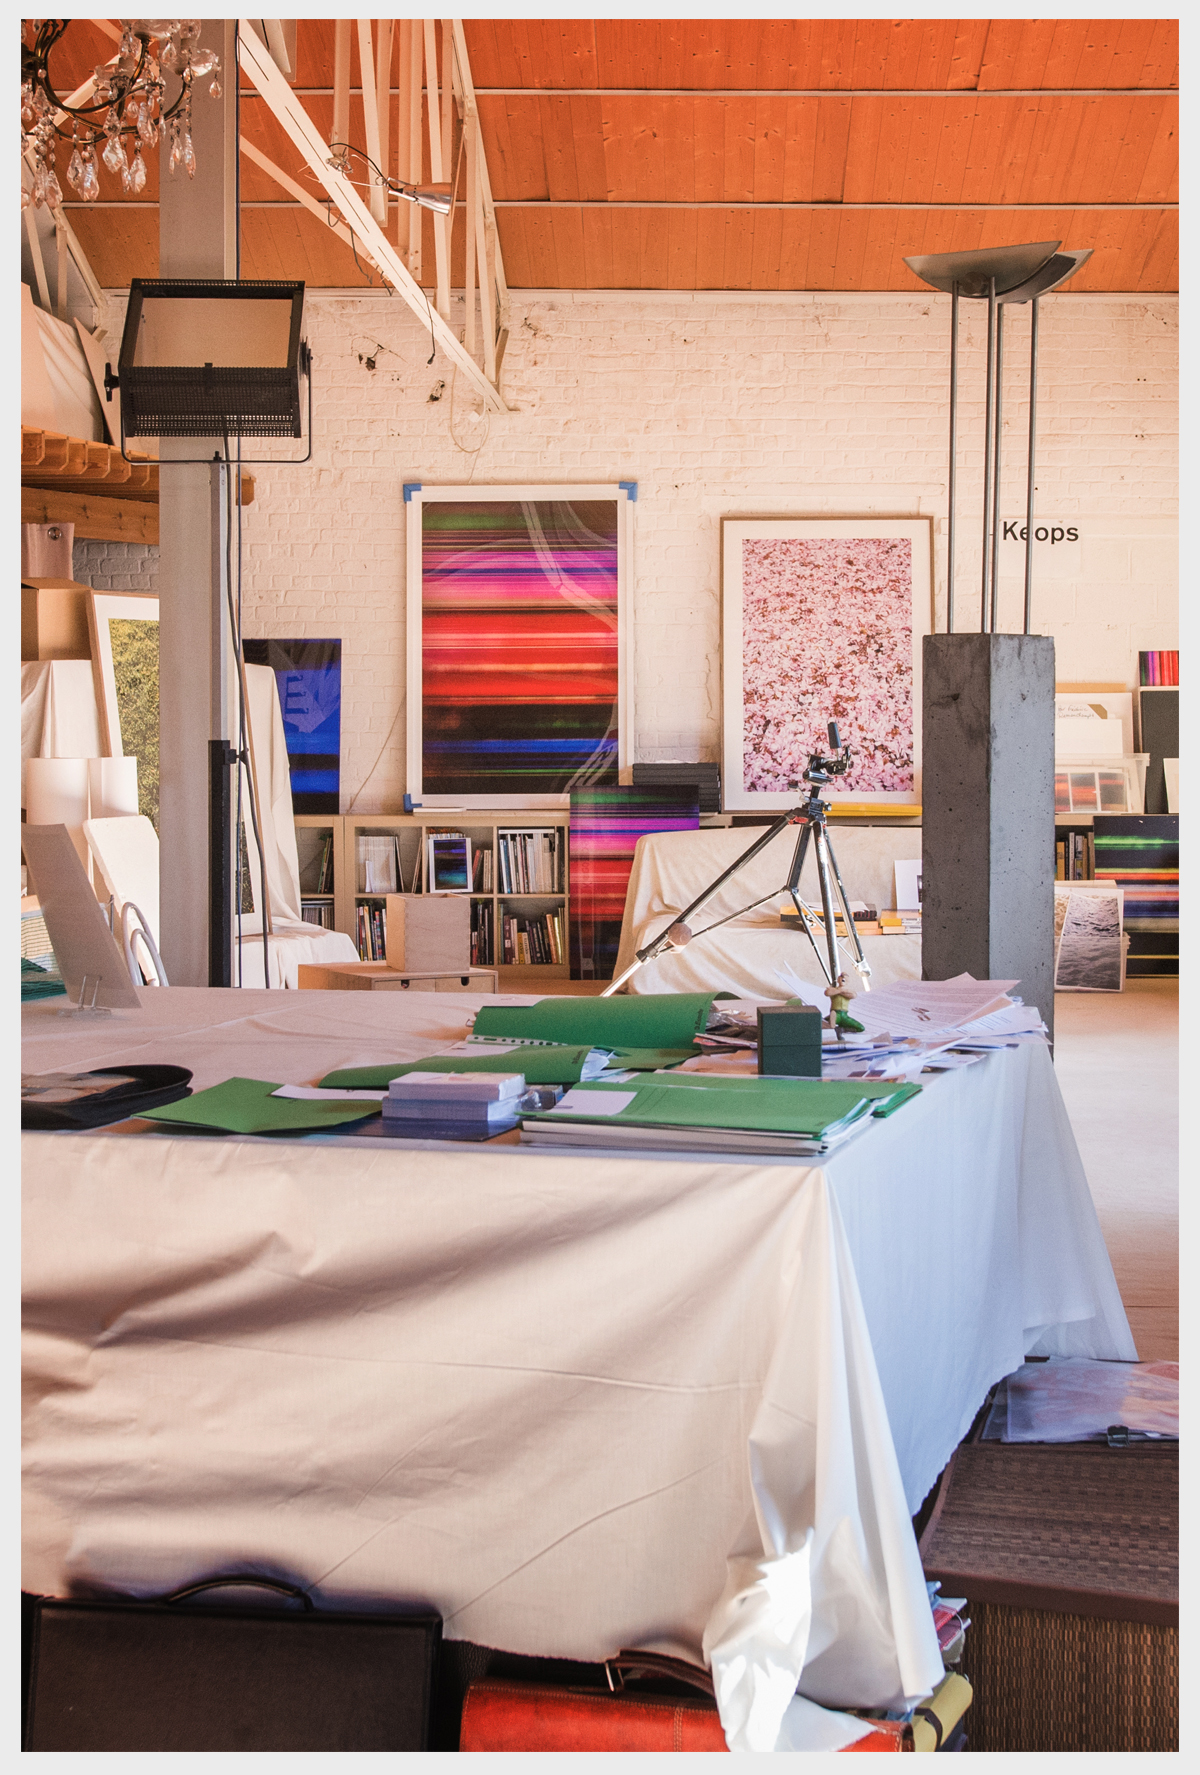 Frederic Robert Georges ' studio, September 2016, Genval (Brussels)